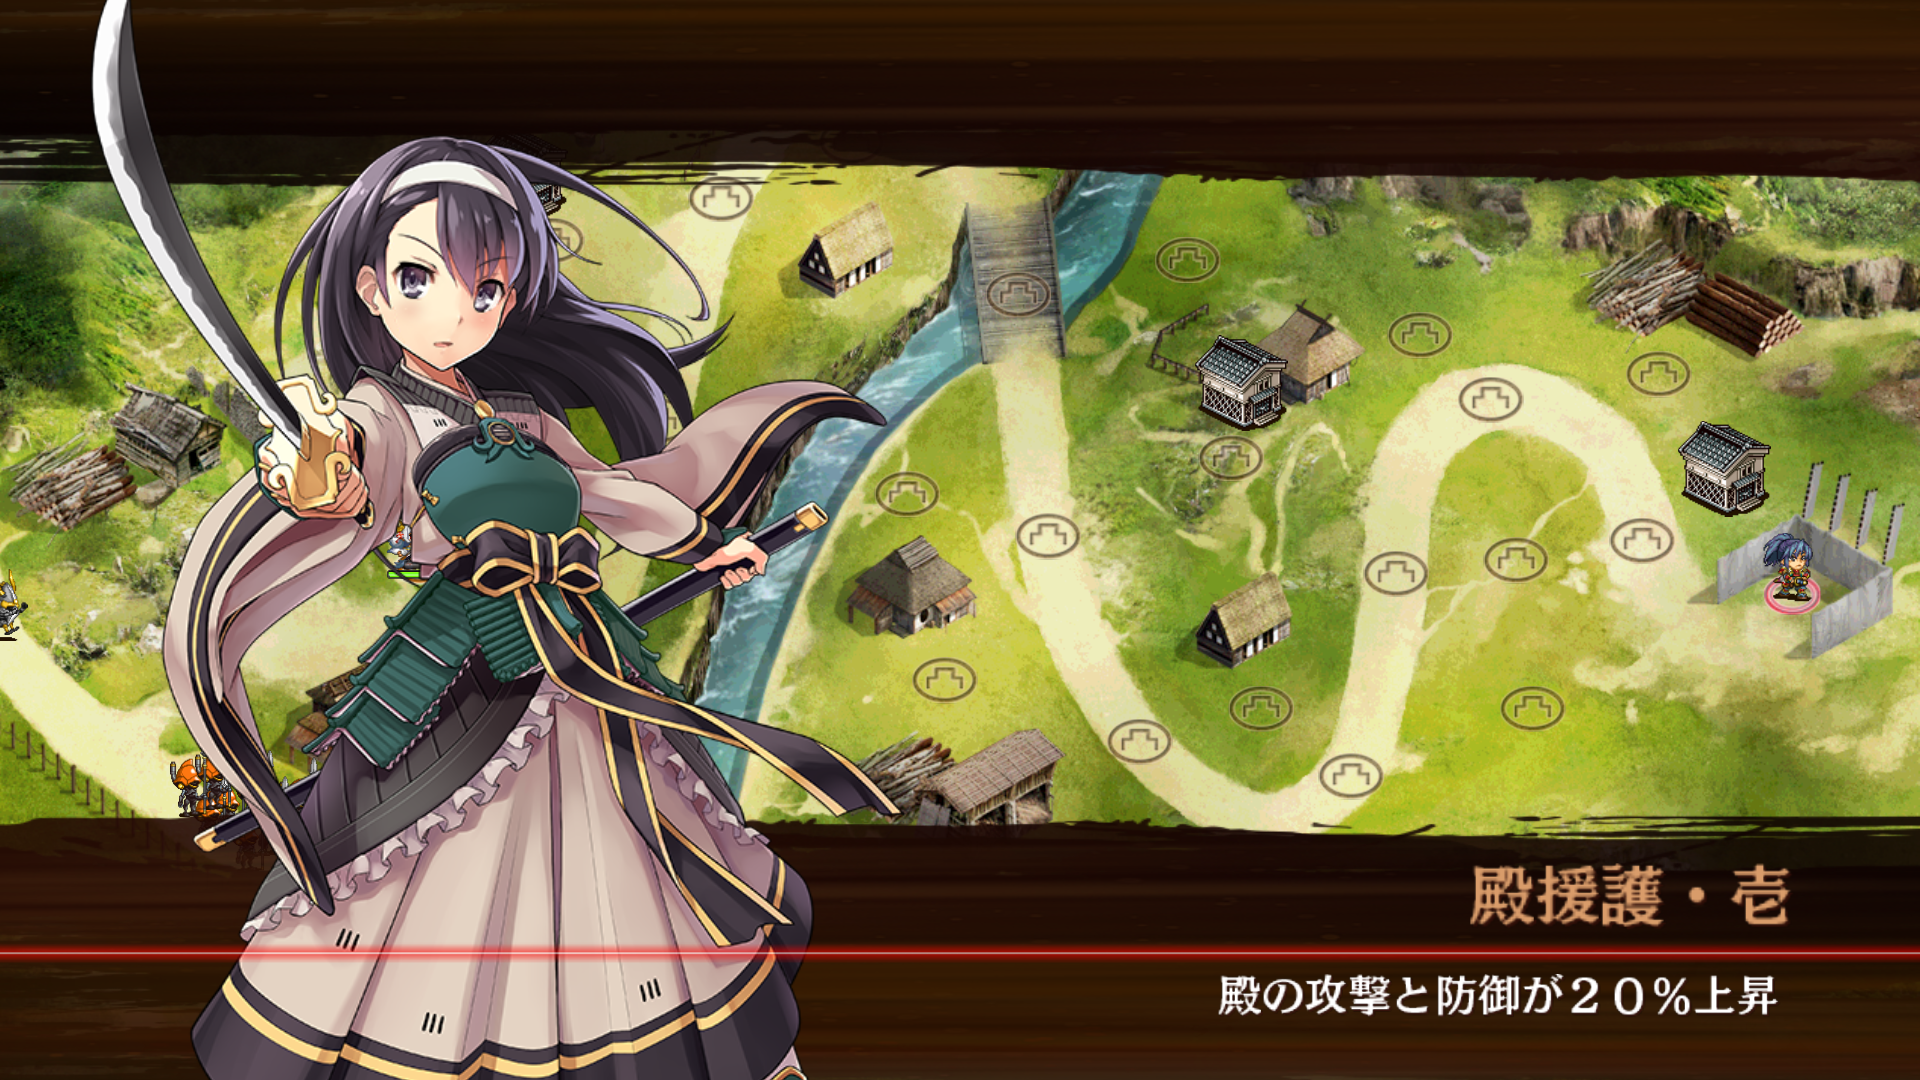 androidアプリ 御城プロジェクト:RE(城プロ)攻略スクリーンショット3